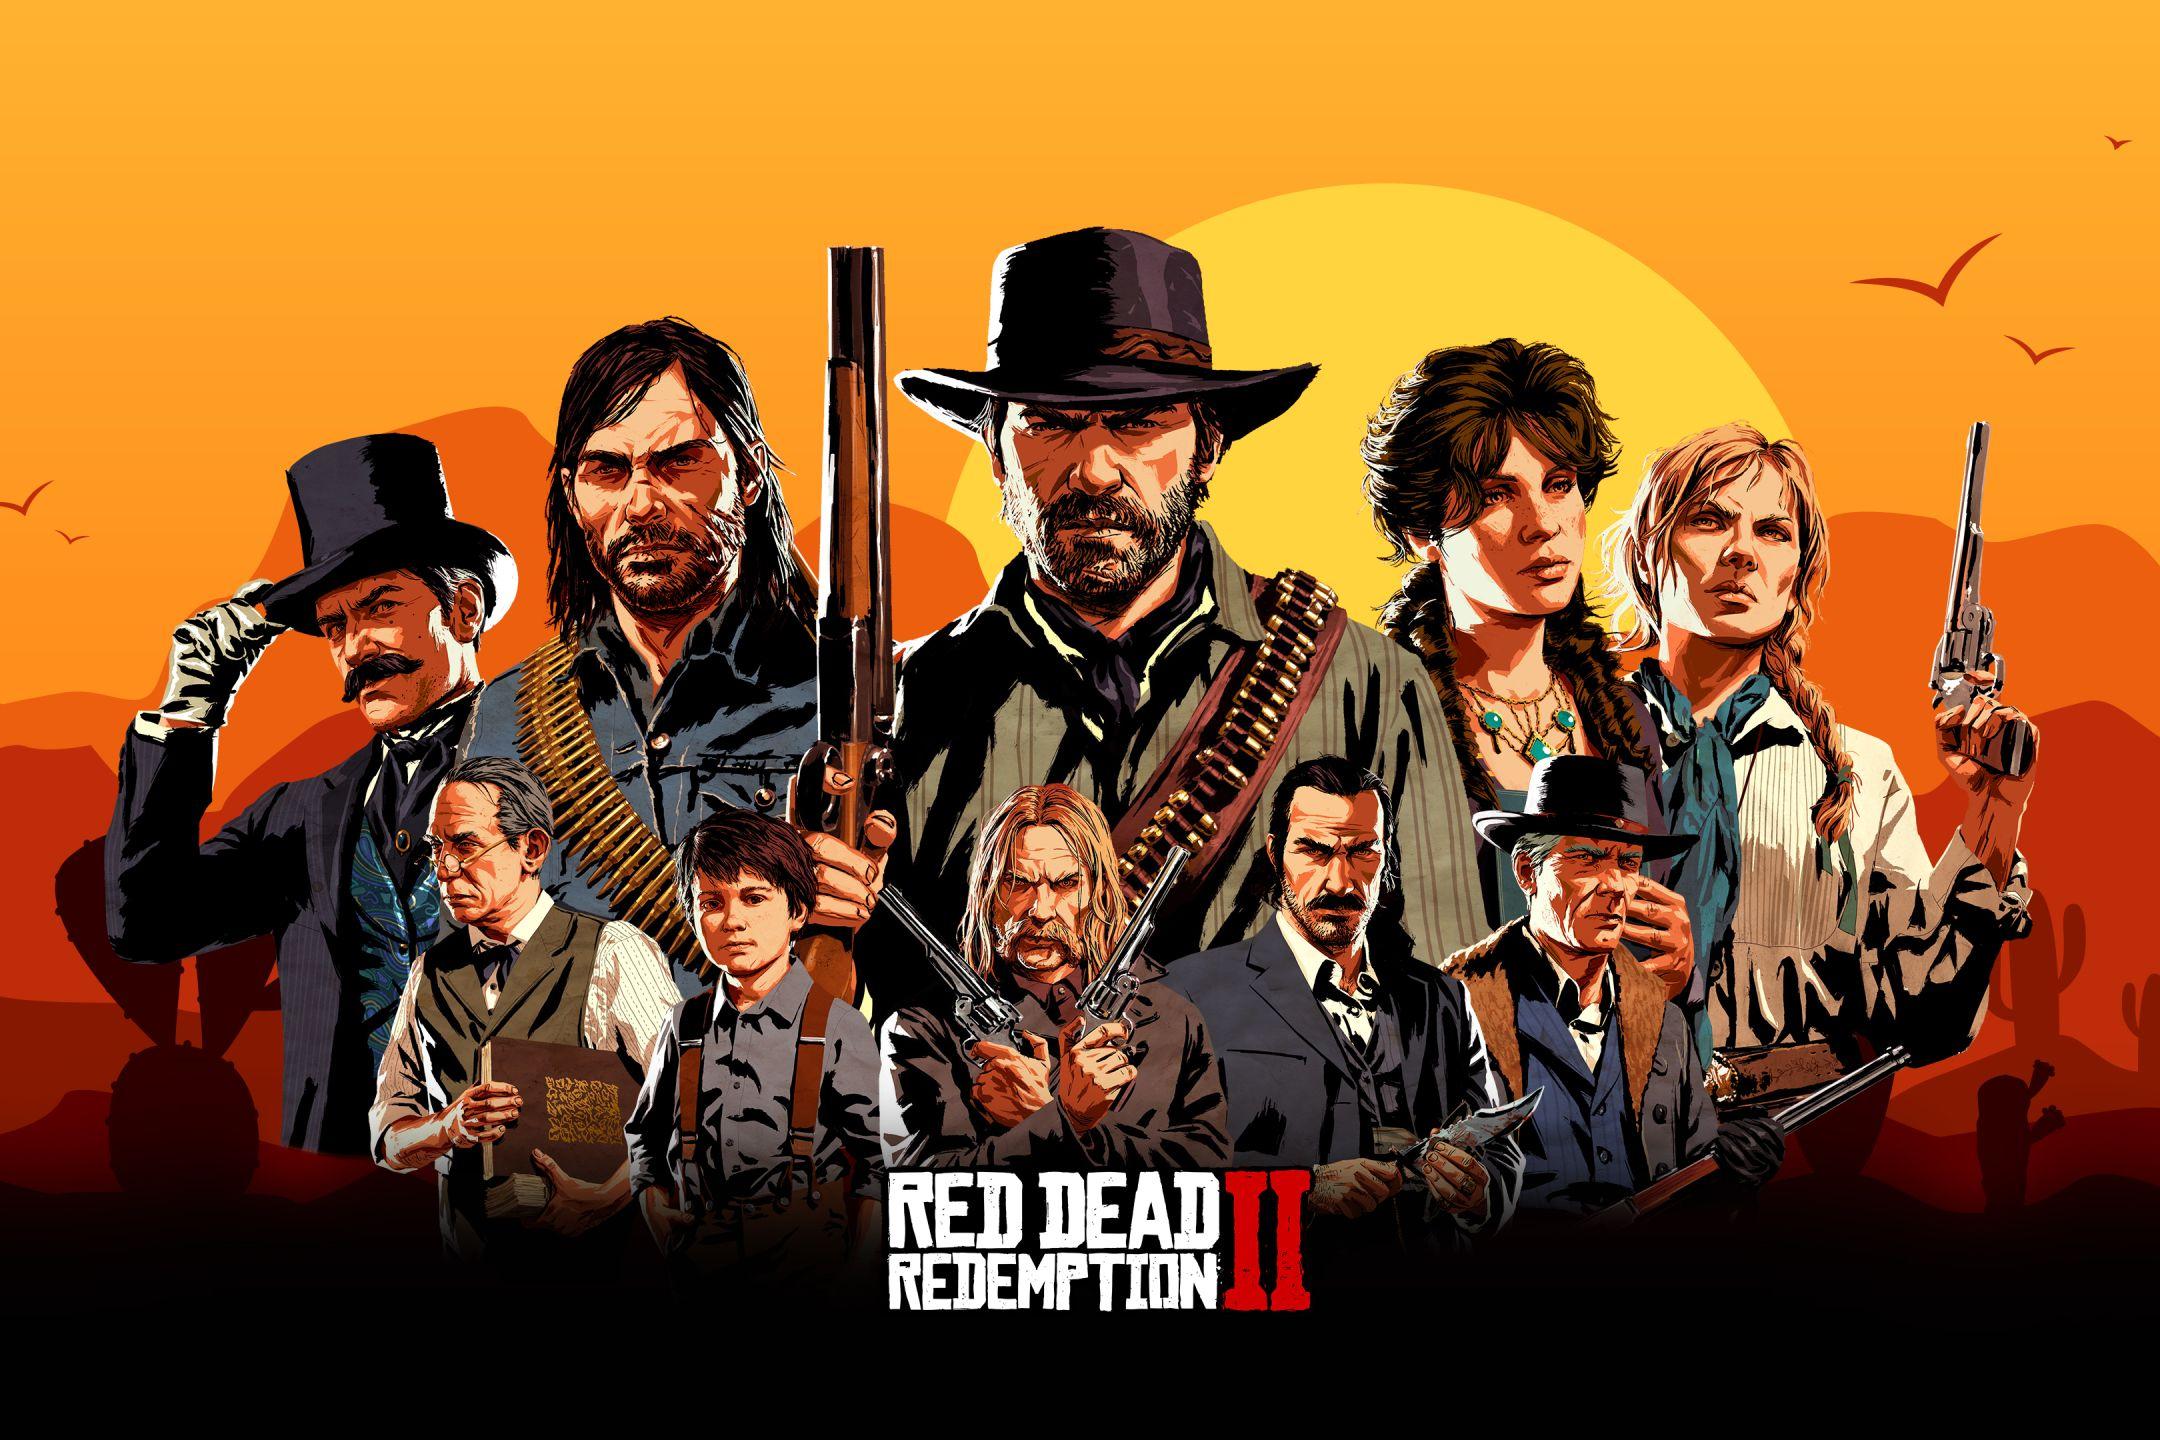 13 Red Dead Redemption Wallpaper Red Dead Redemption Art Red